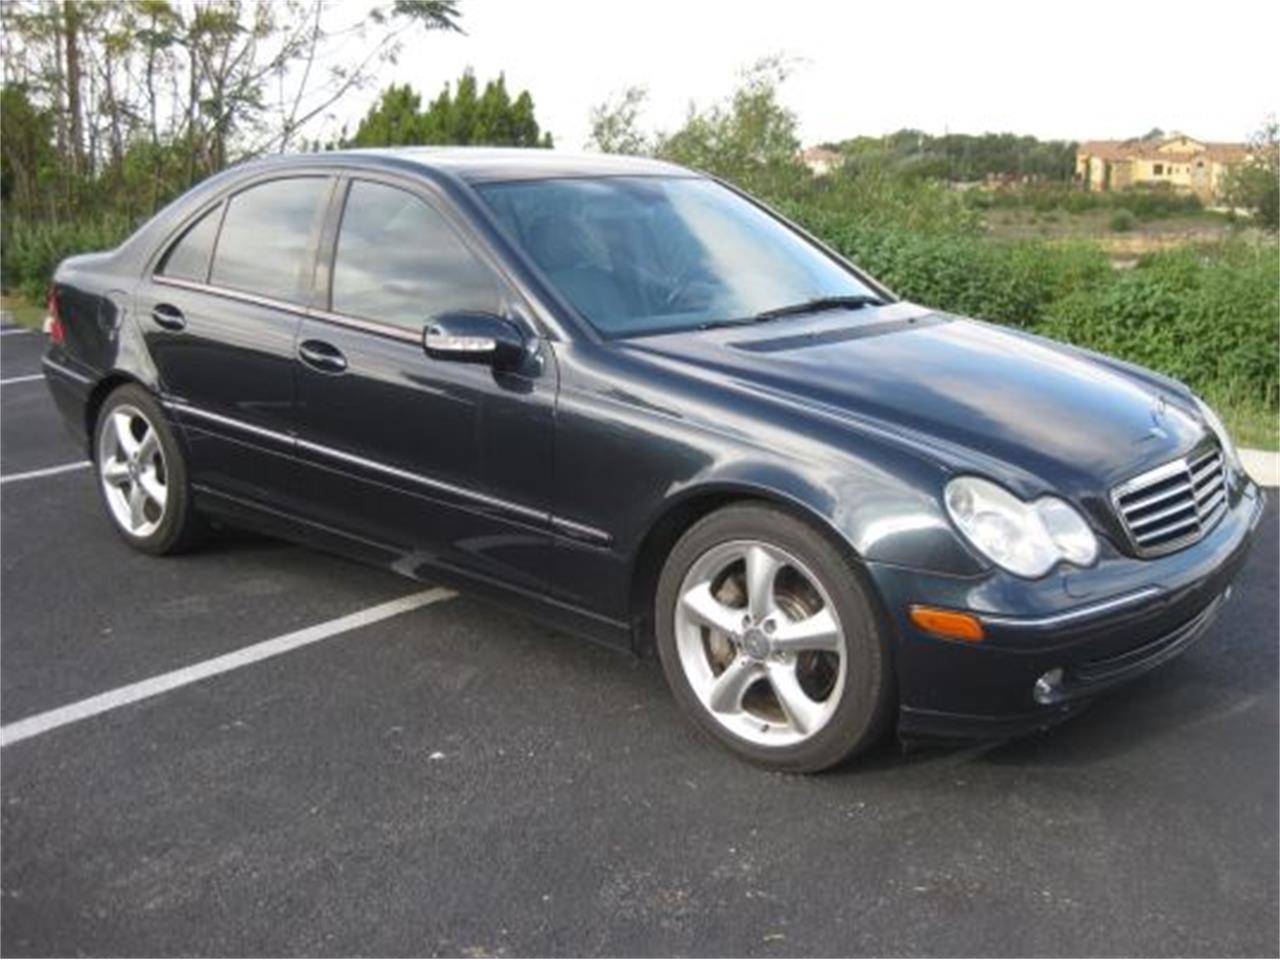 2004 Mercedes Benz C230 Kompressor Coupe For Sale Classiccars Com